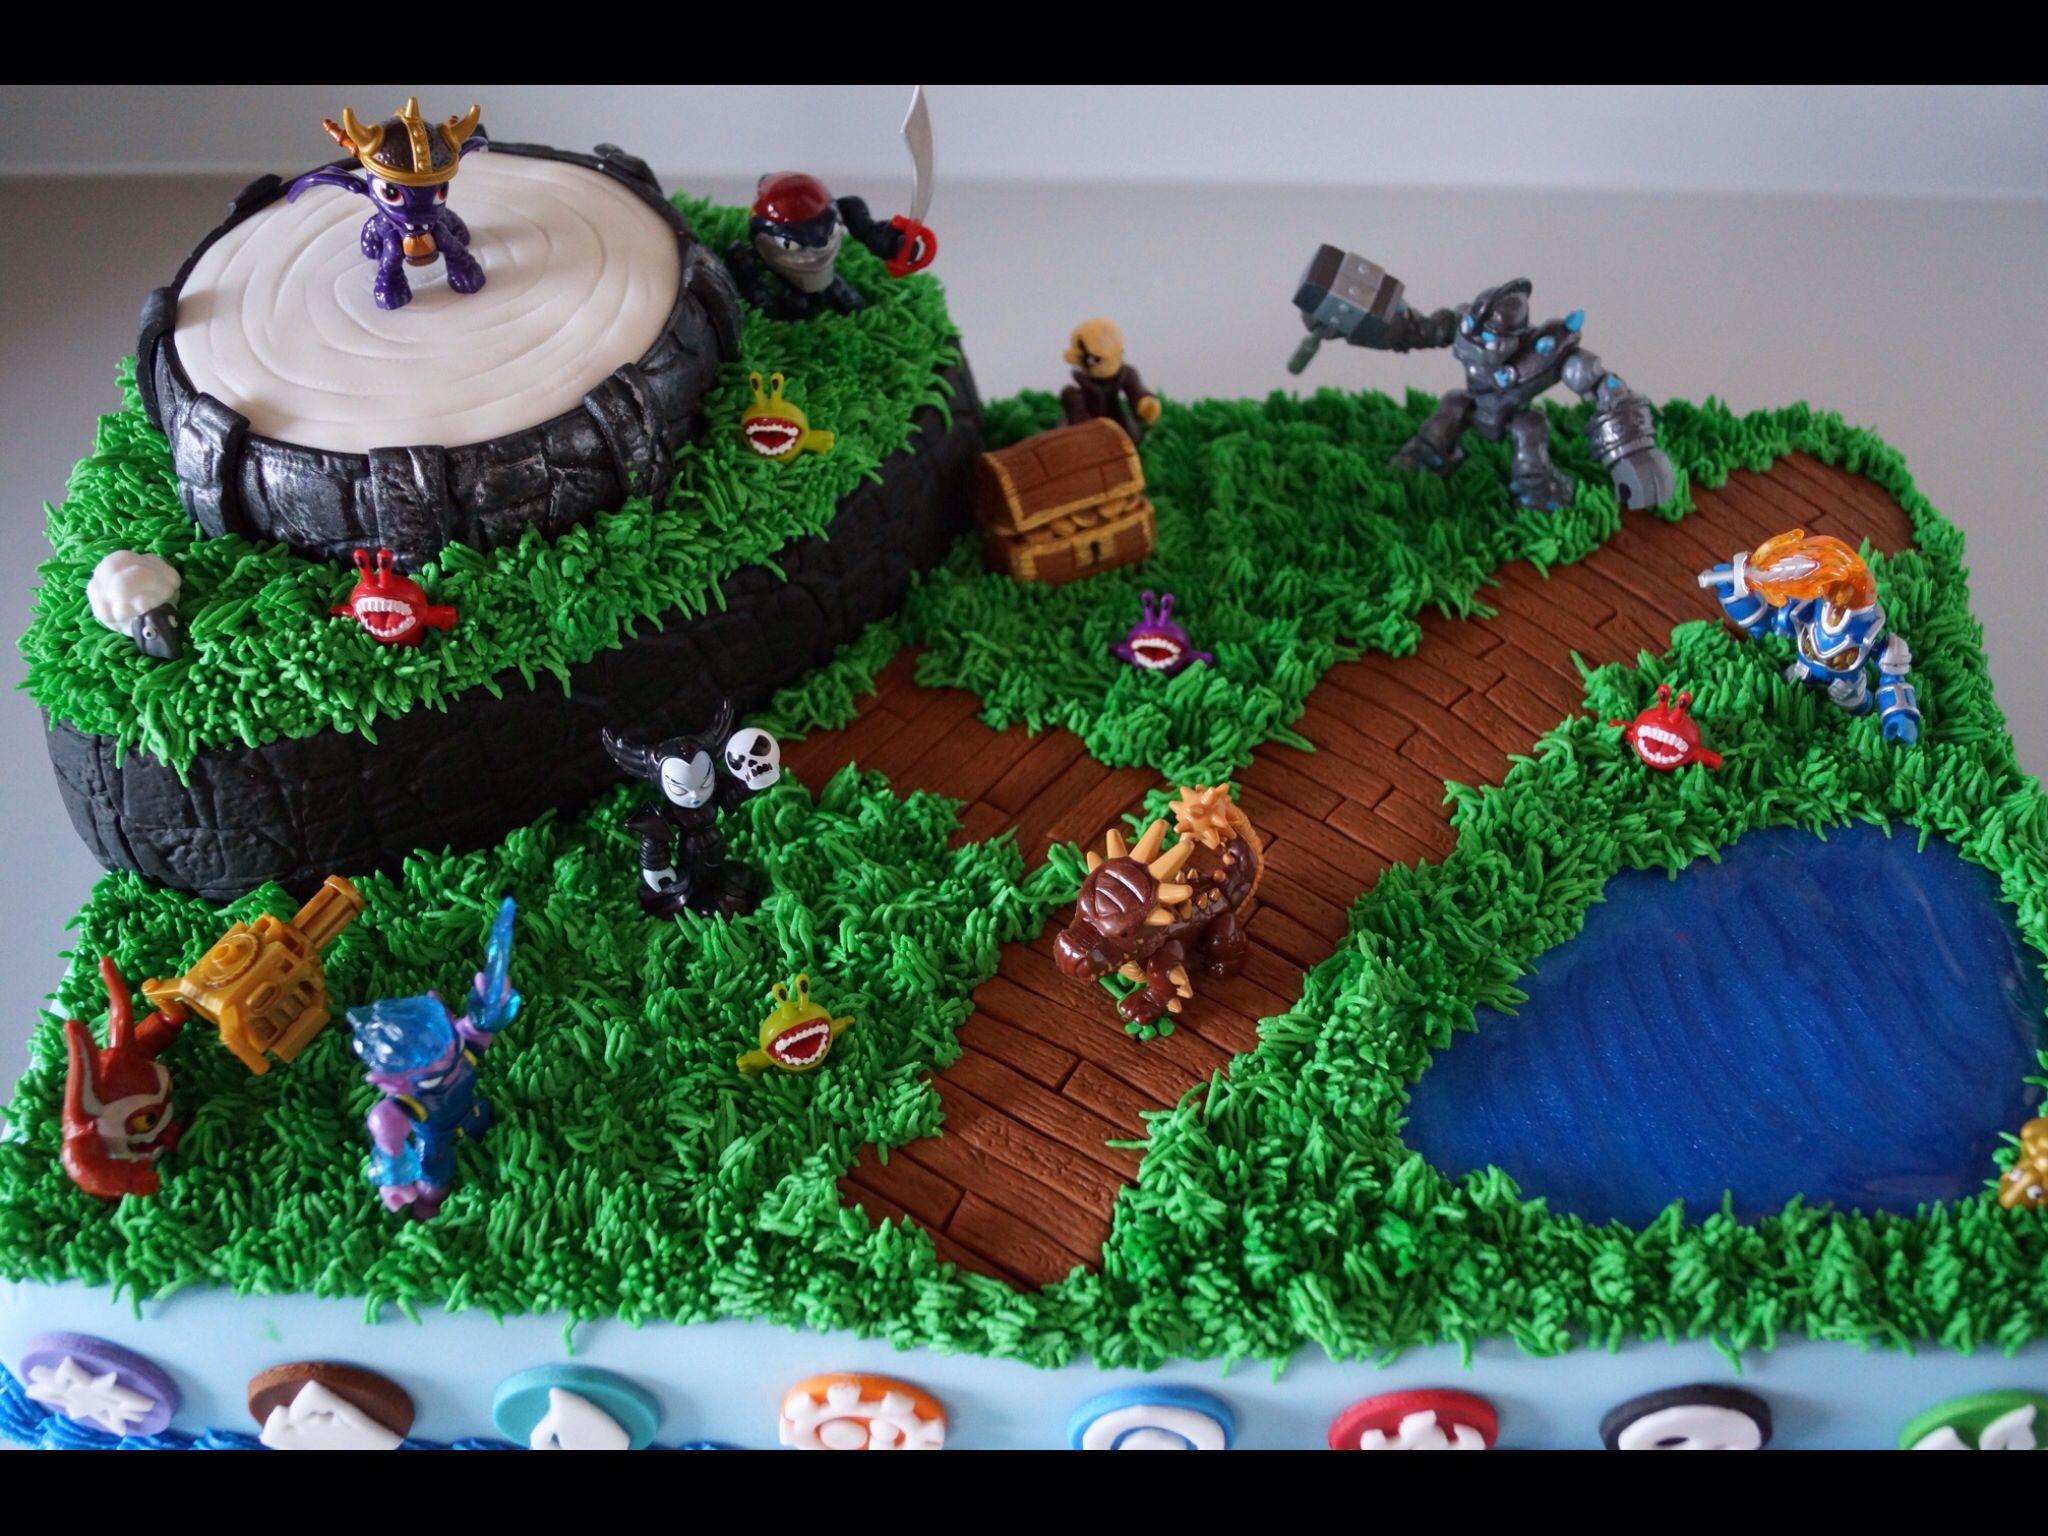 skylanders cake ideas Google Search Birthday cakes Pinterest